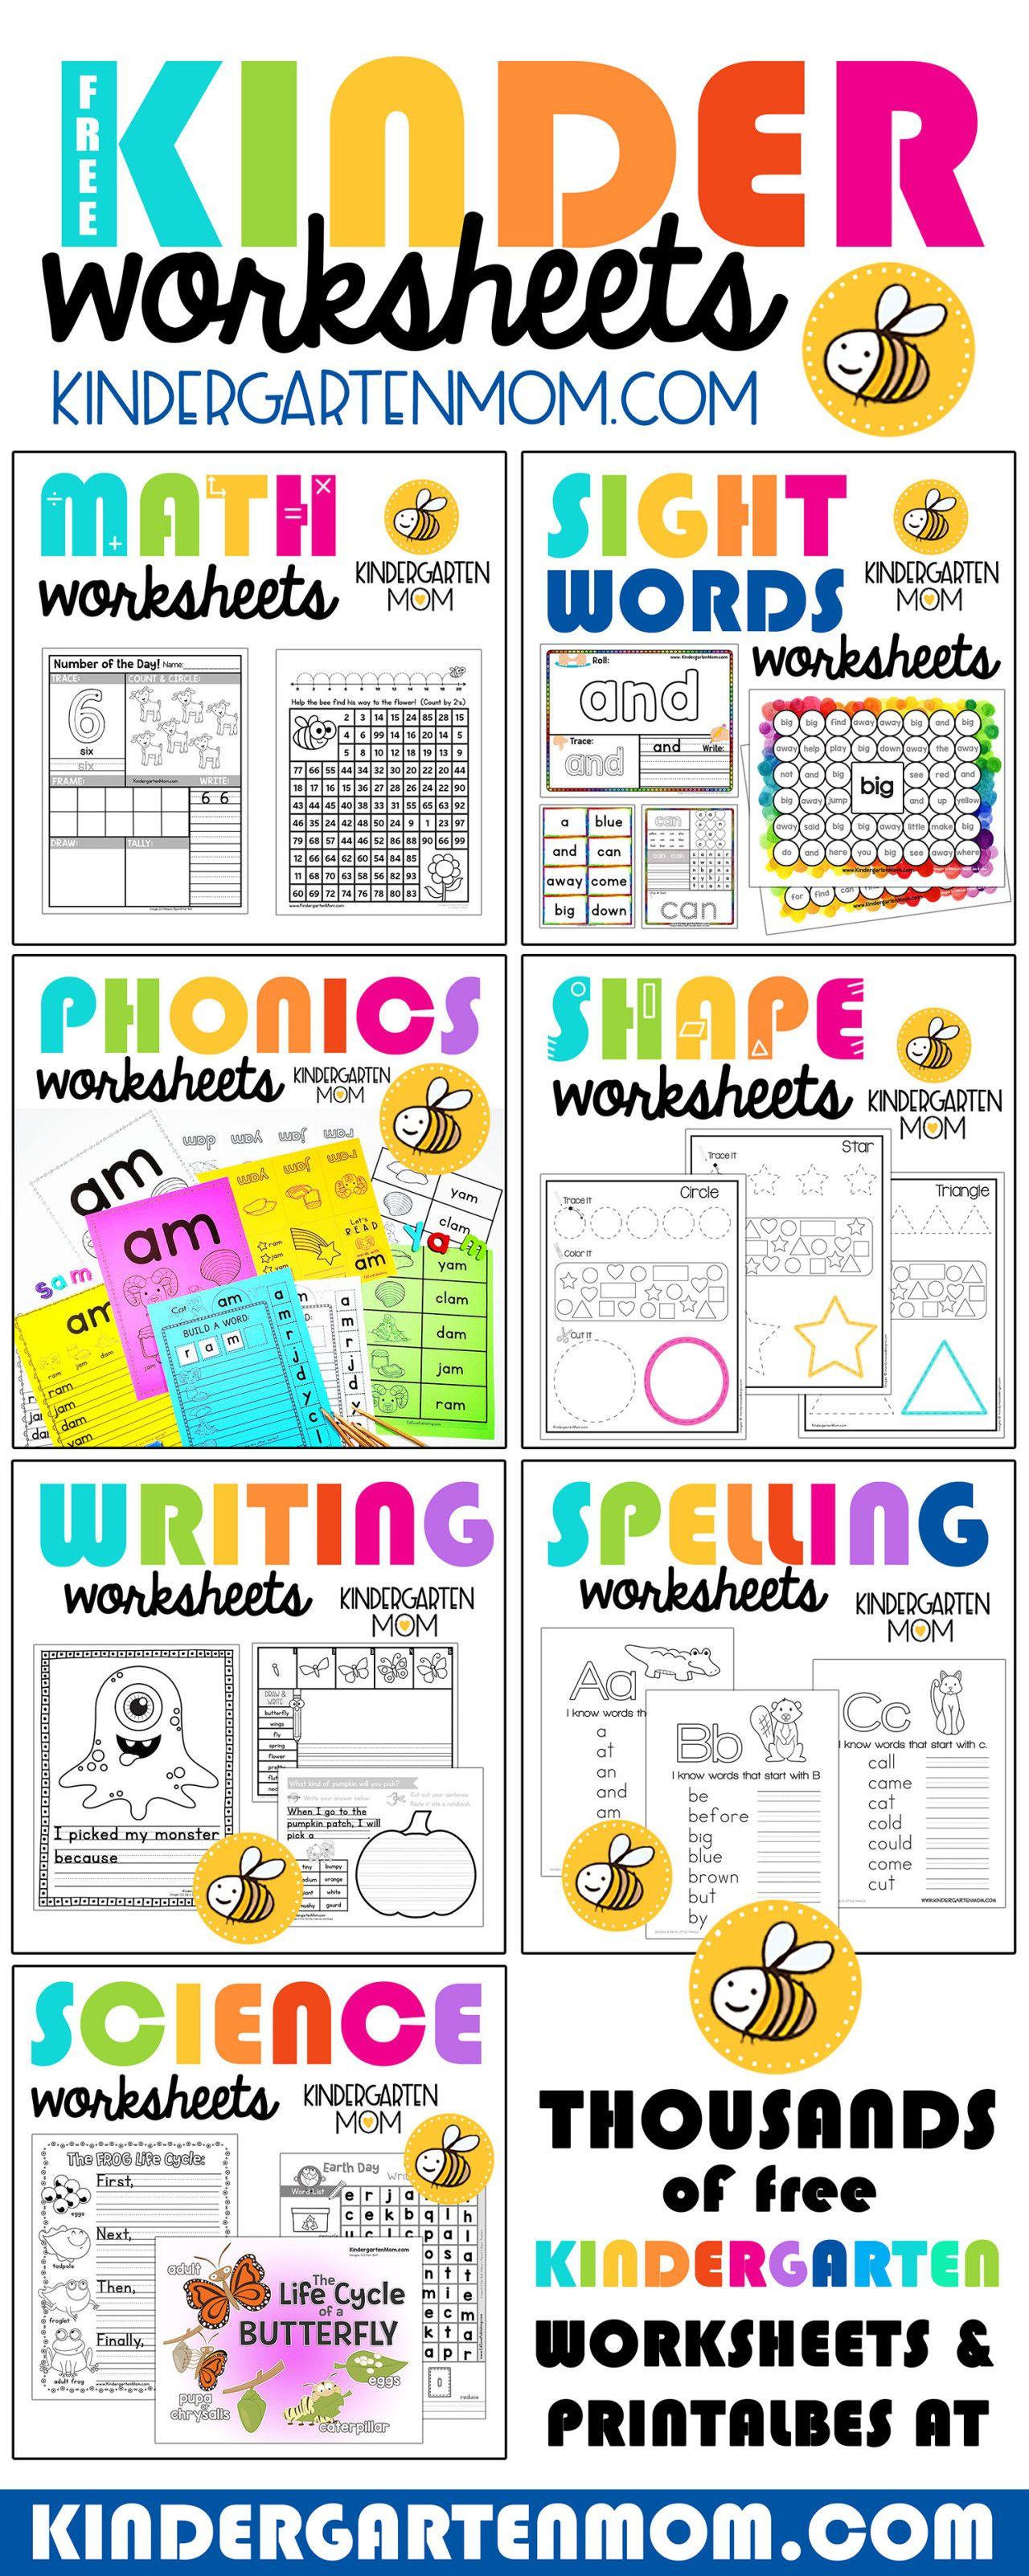 Kindergarten Worksheets Thousands Of Free Kindergarten Worksheets And Kindergarten Worksheets Kindergarten Worksheets Sight Words Free Kindergarten Worksheets [ 3205 x 1280 Pixel ]